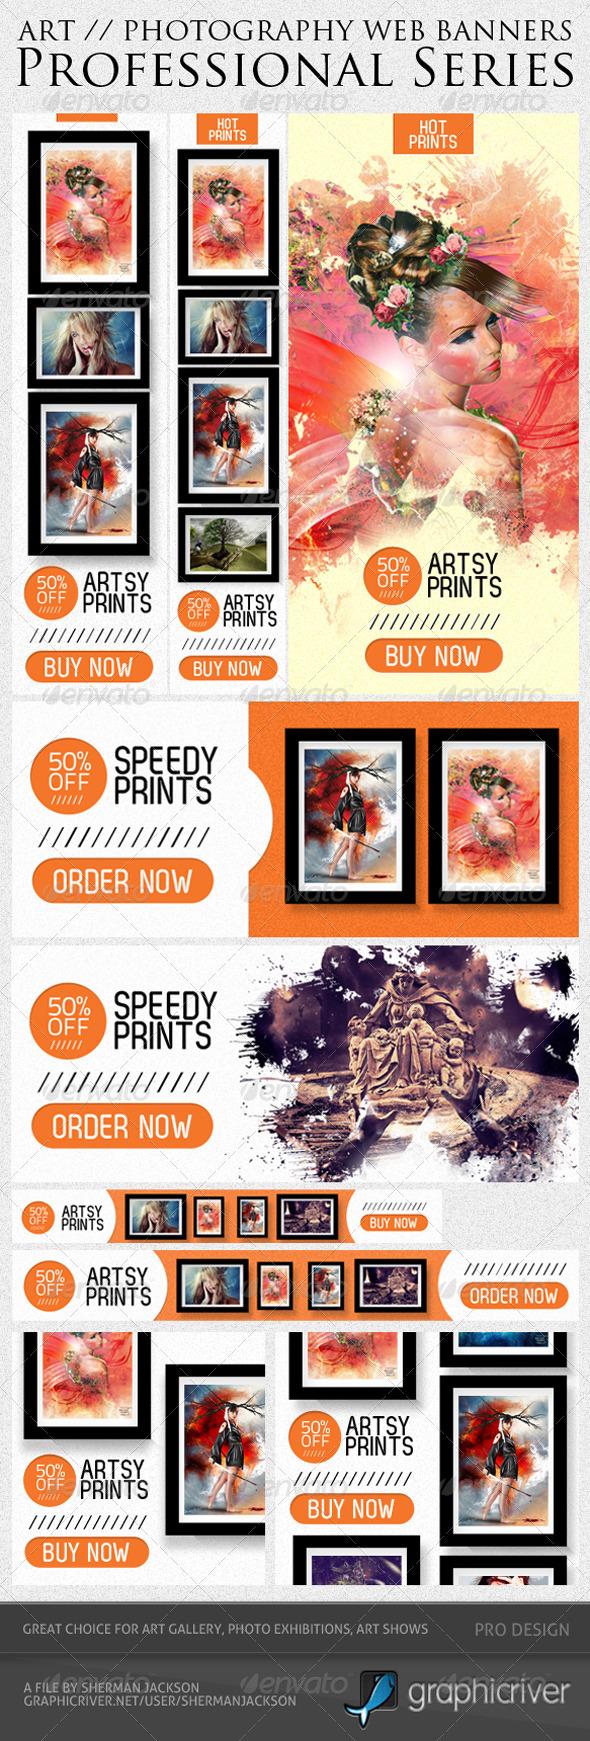 Graphicriver Banner Graphics, Designs & Templates